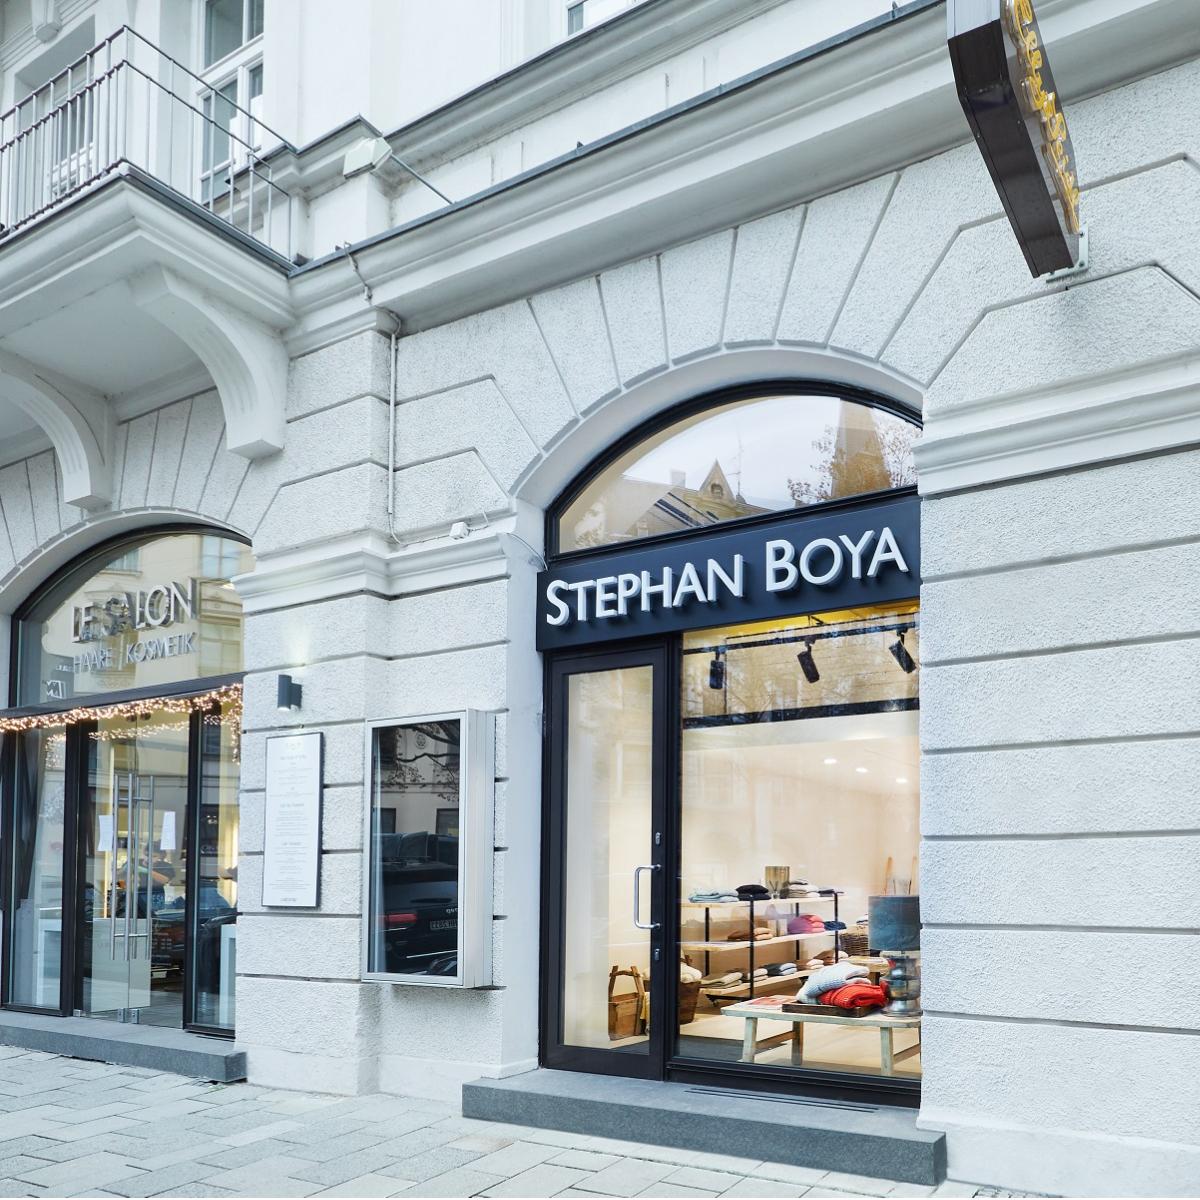 Stephan Boya (1)